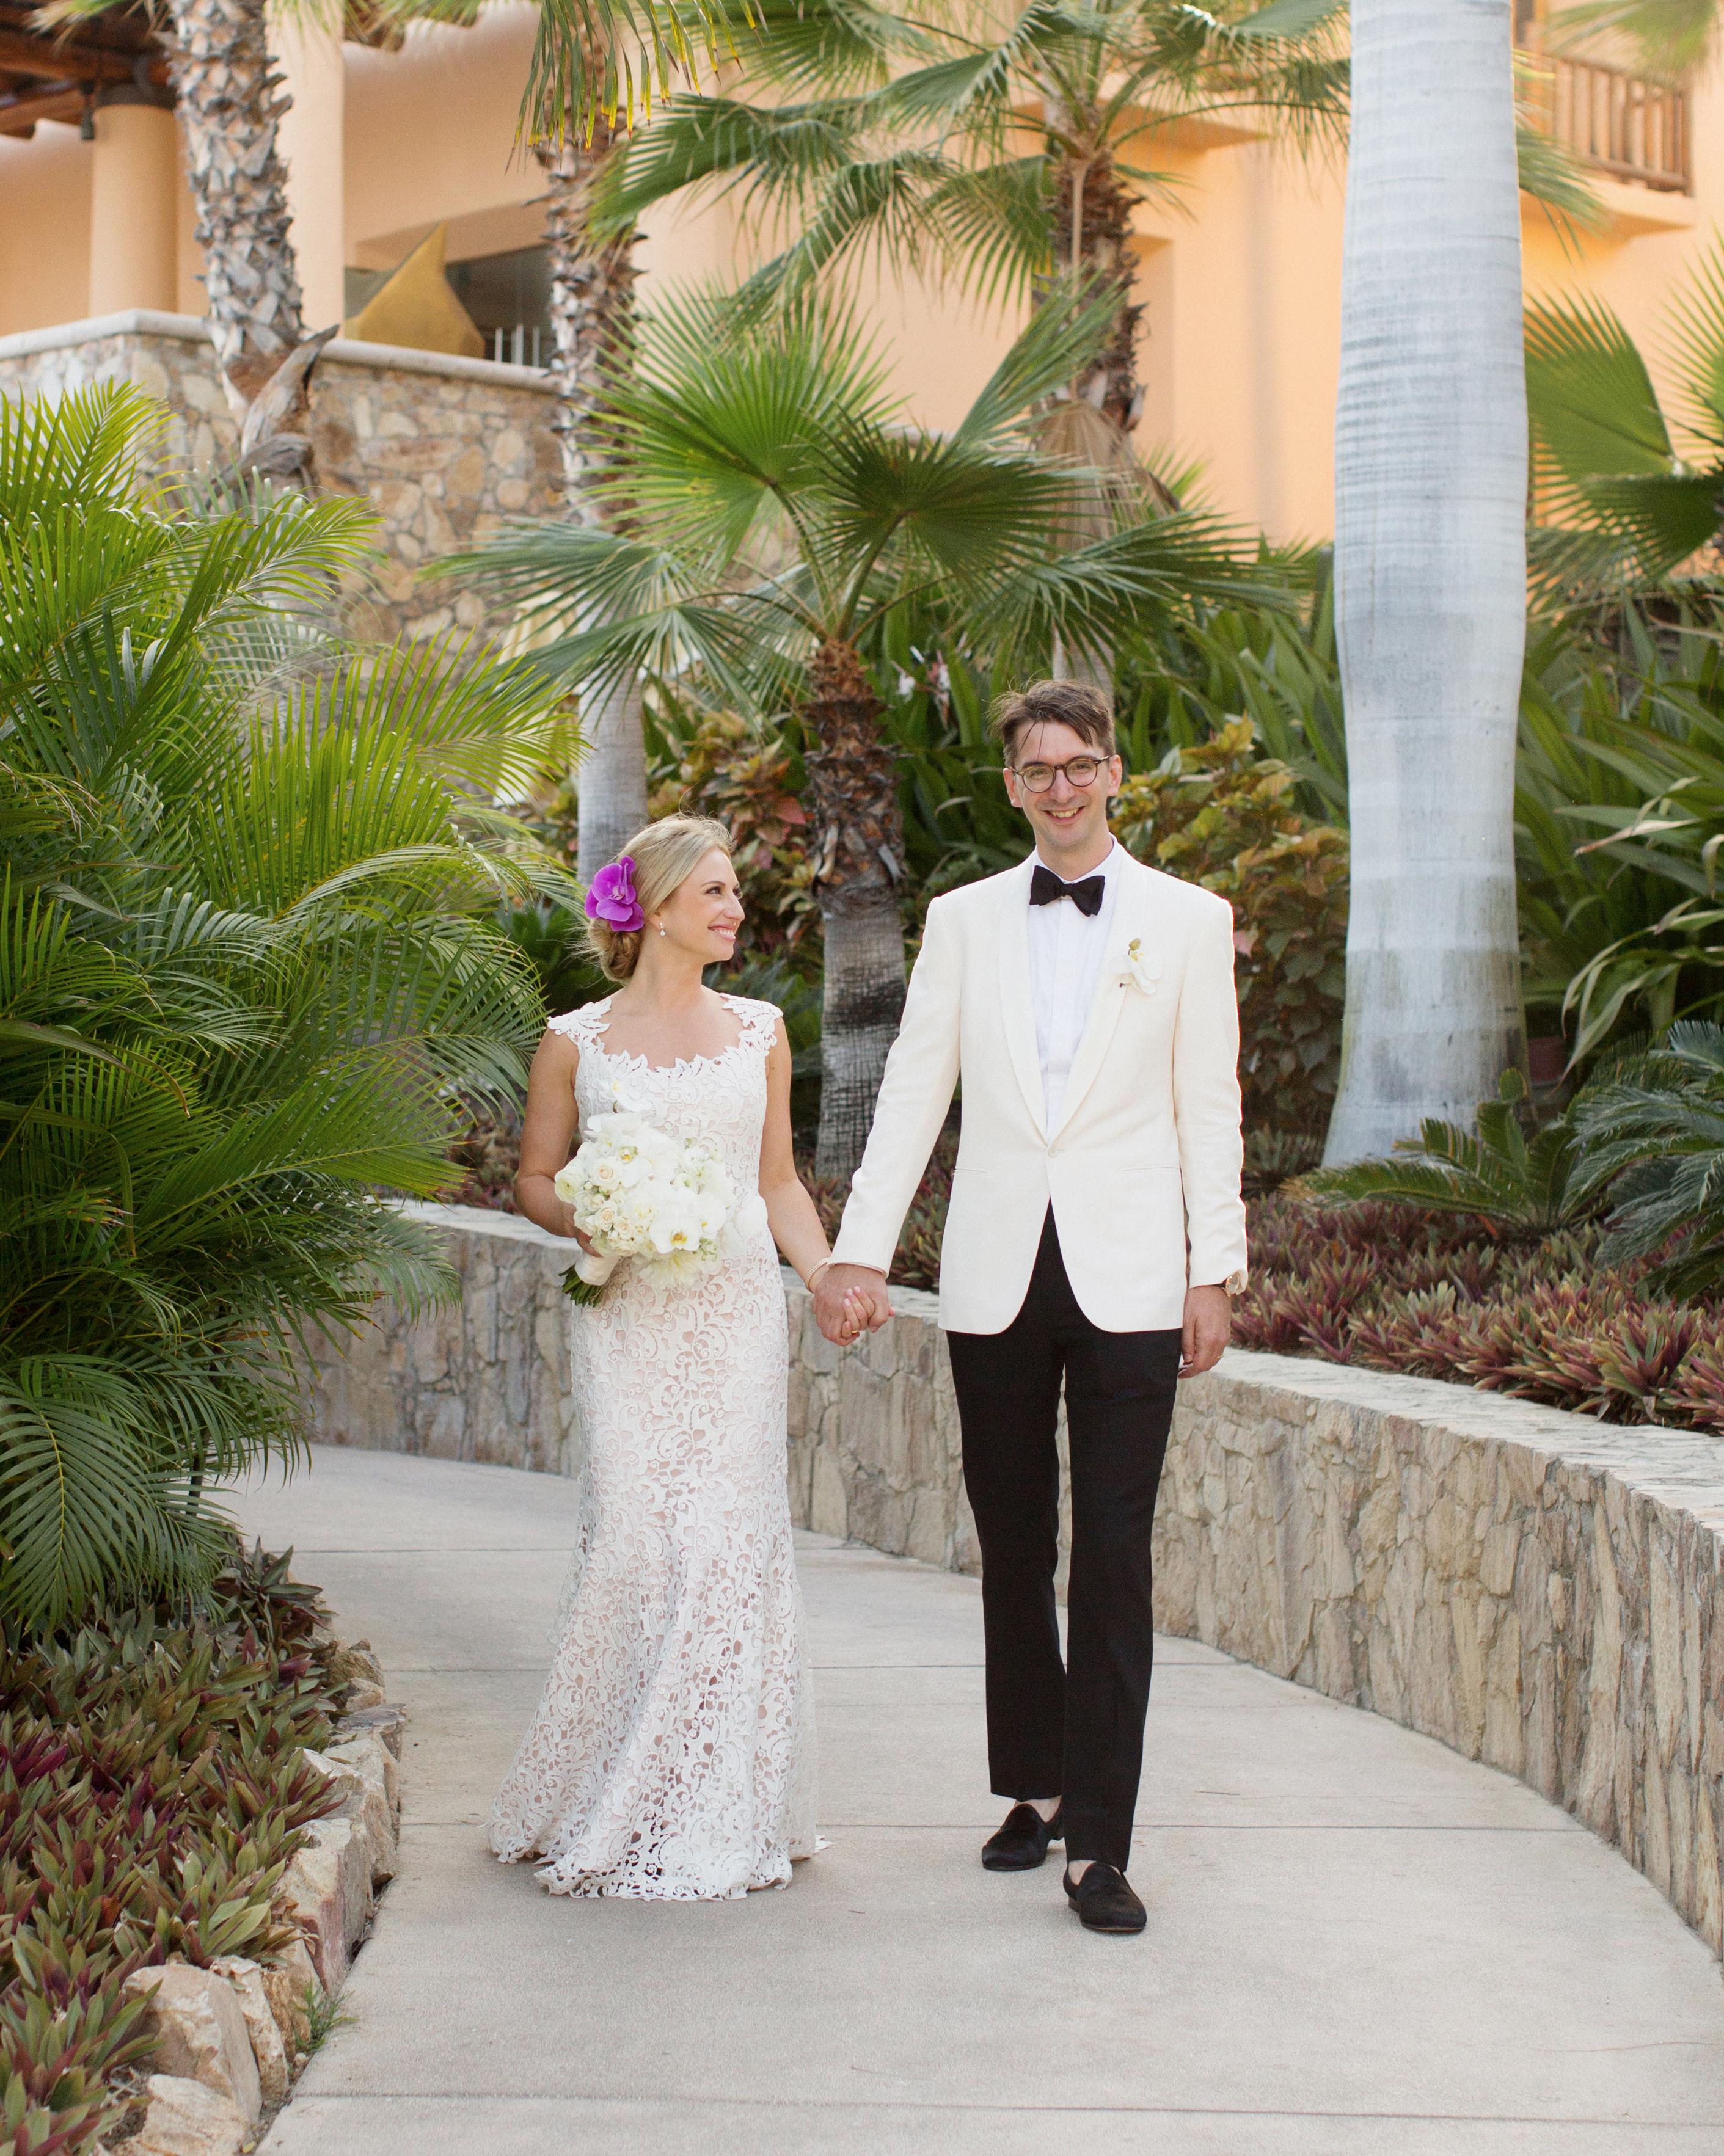 veronica-mathieu-wedding-couple-0897-s111501-1014.jpg